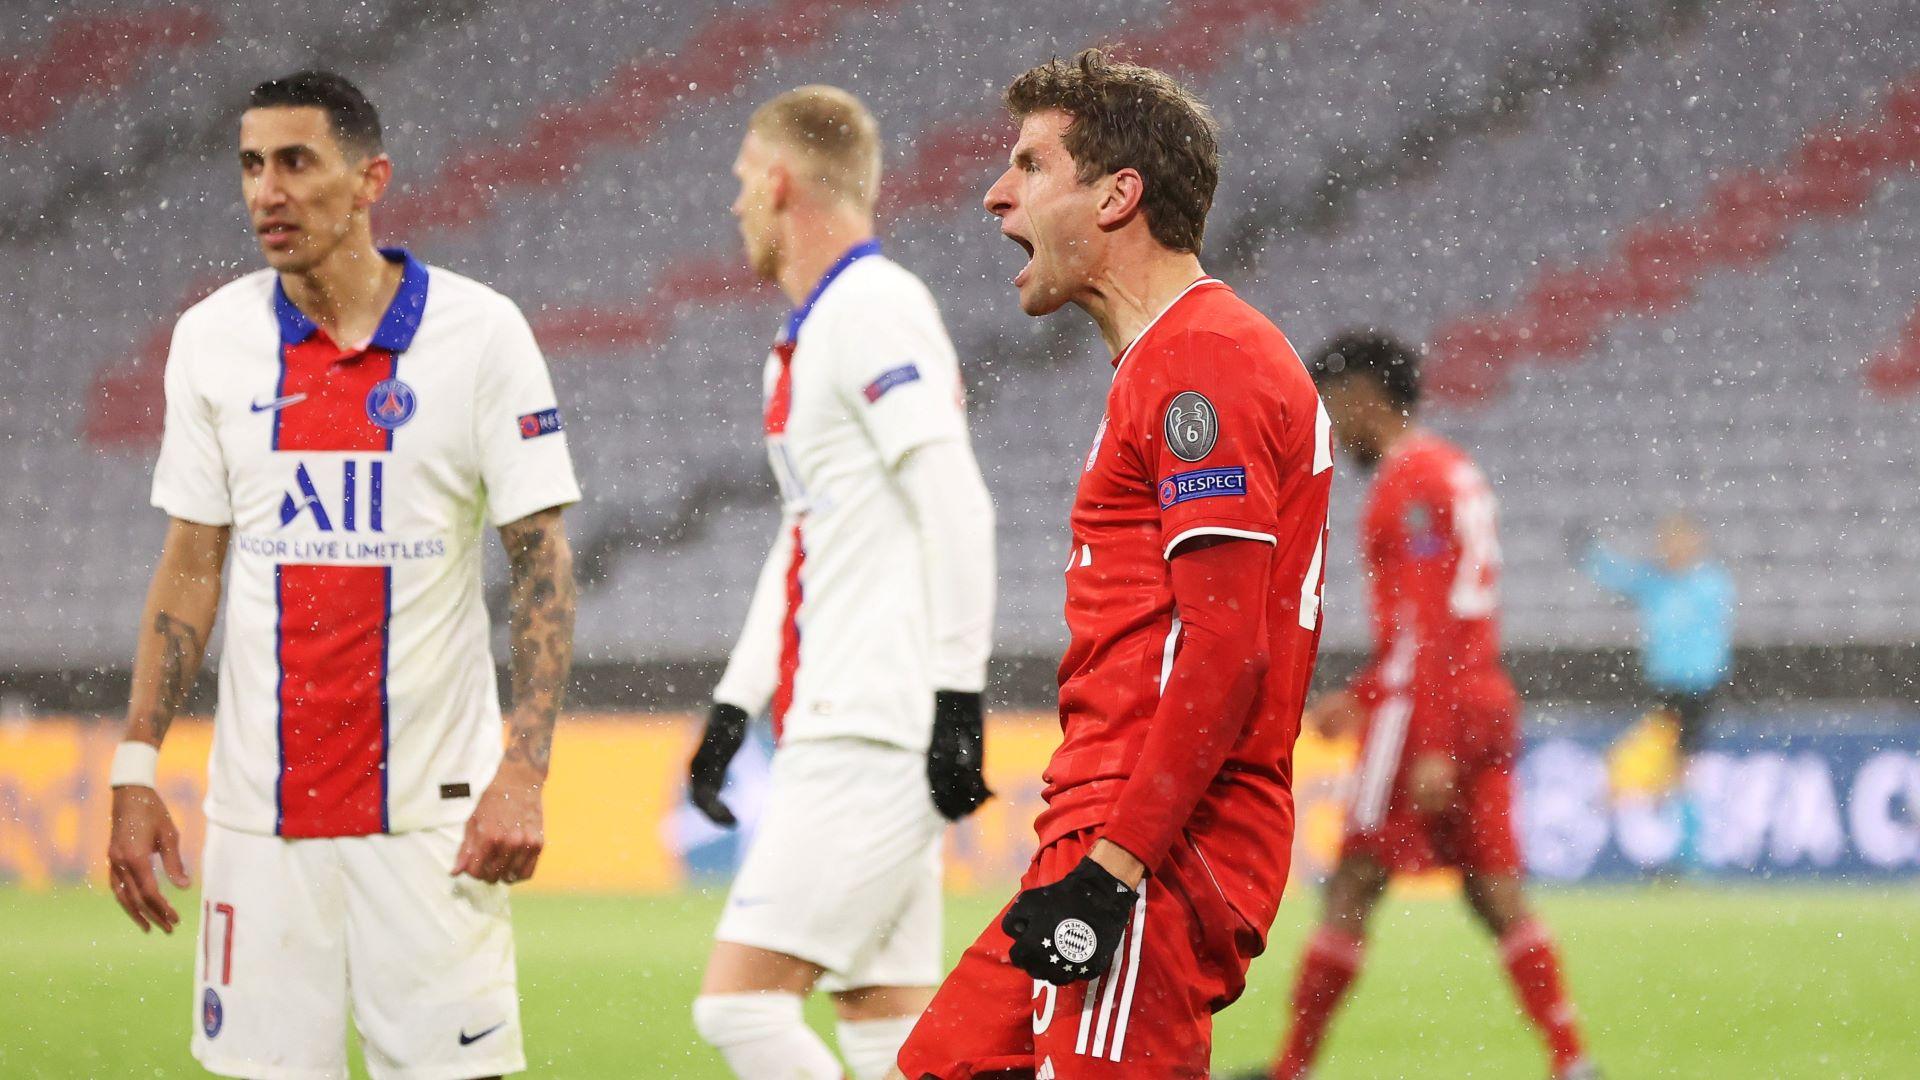 PSG FC Bayern München Müller Di Maria Livestream TV